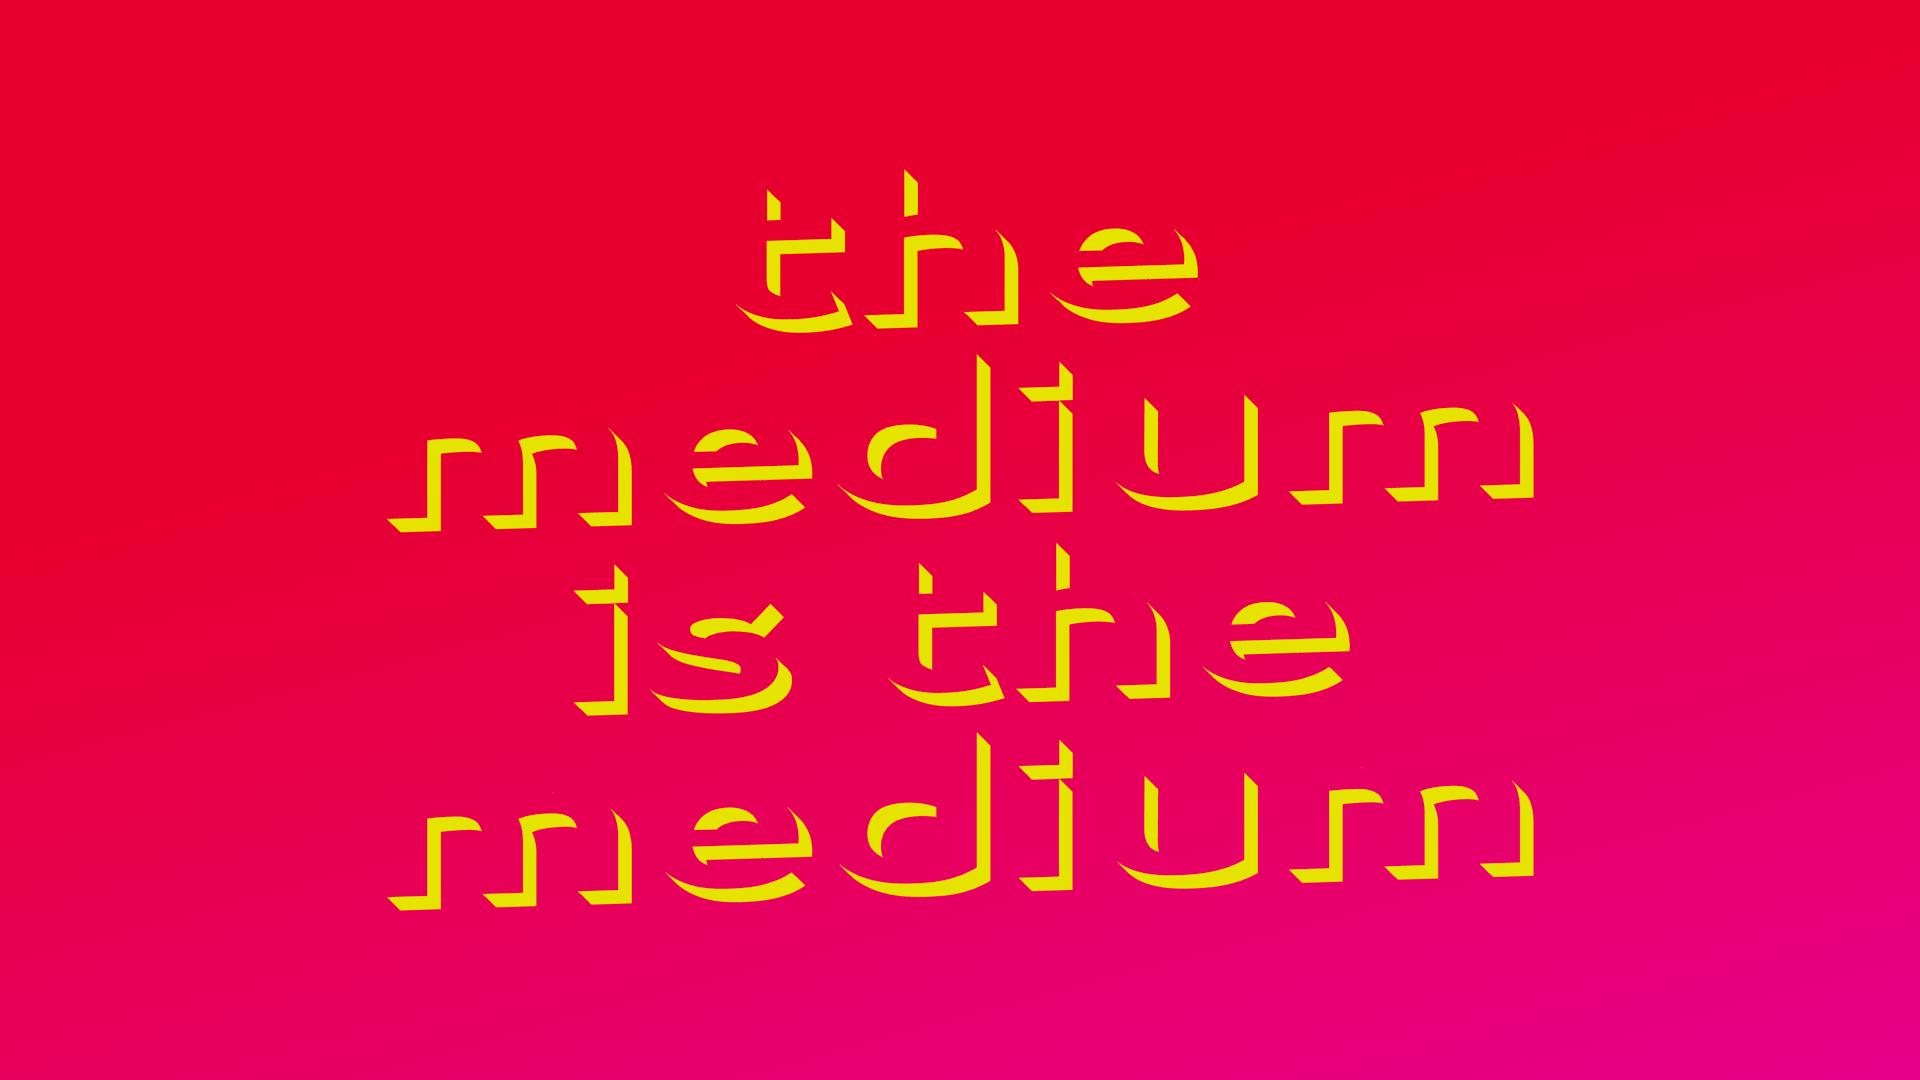 THE MEDIUM IS THE MEDIUM by Phen0m77